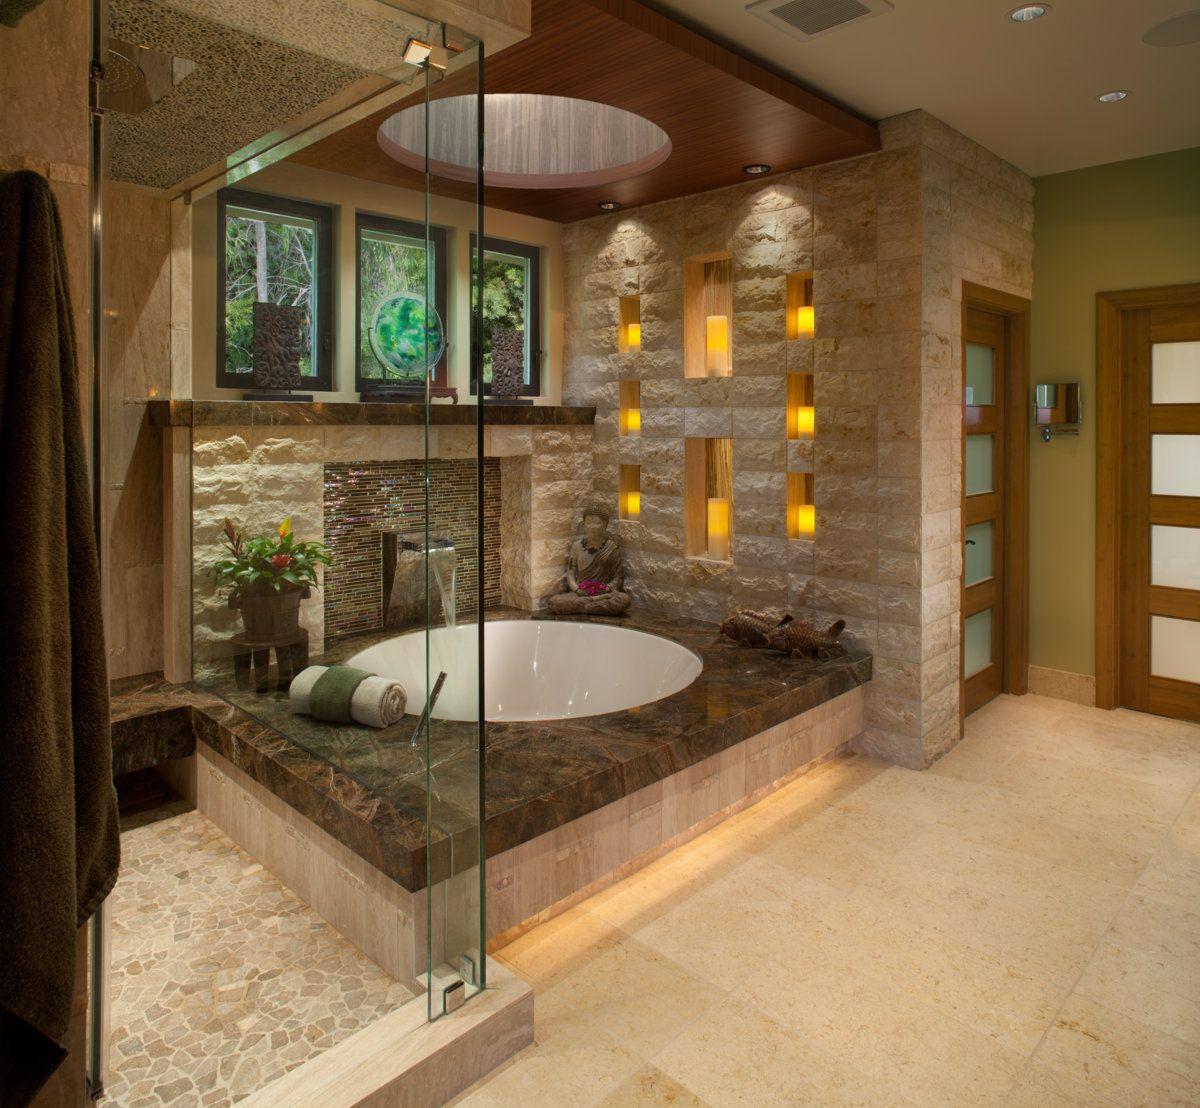 Egyptian Style Bathroom Decor Modern Architecture